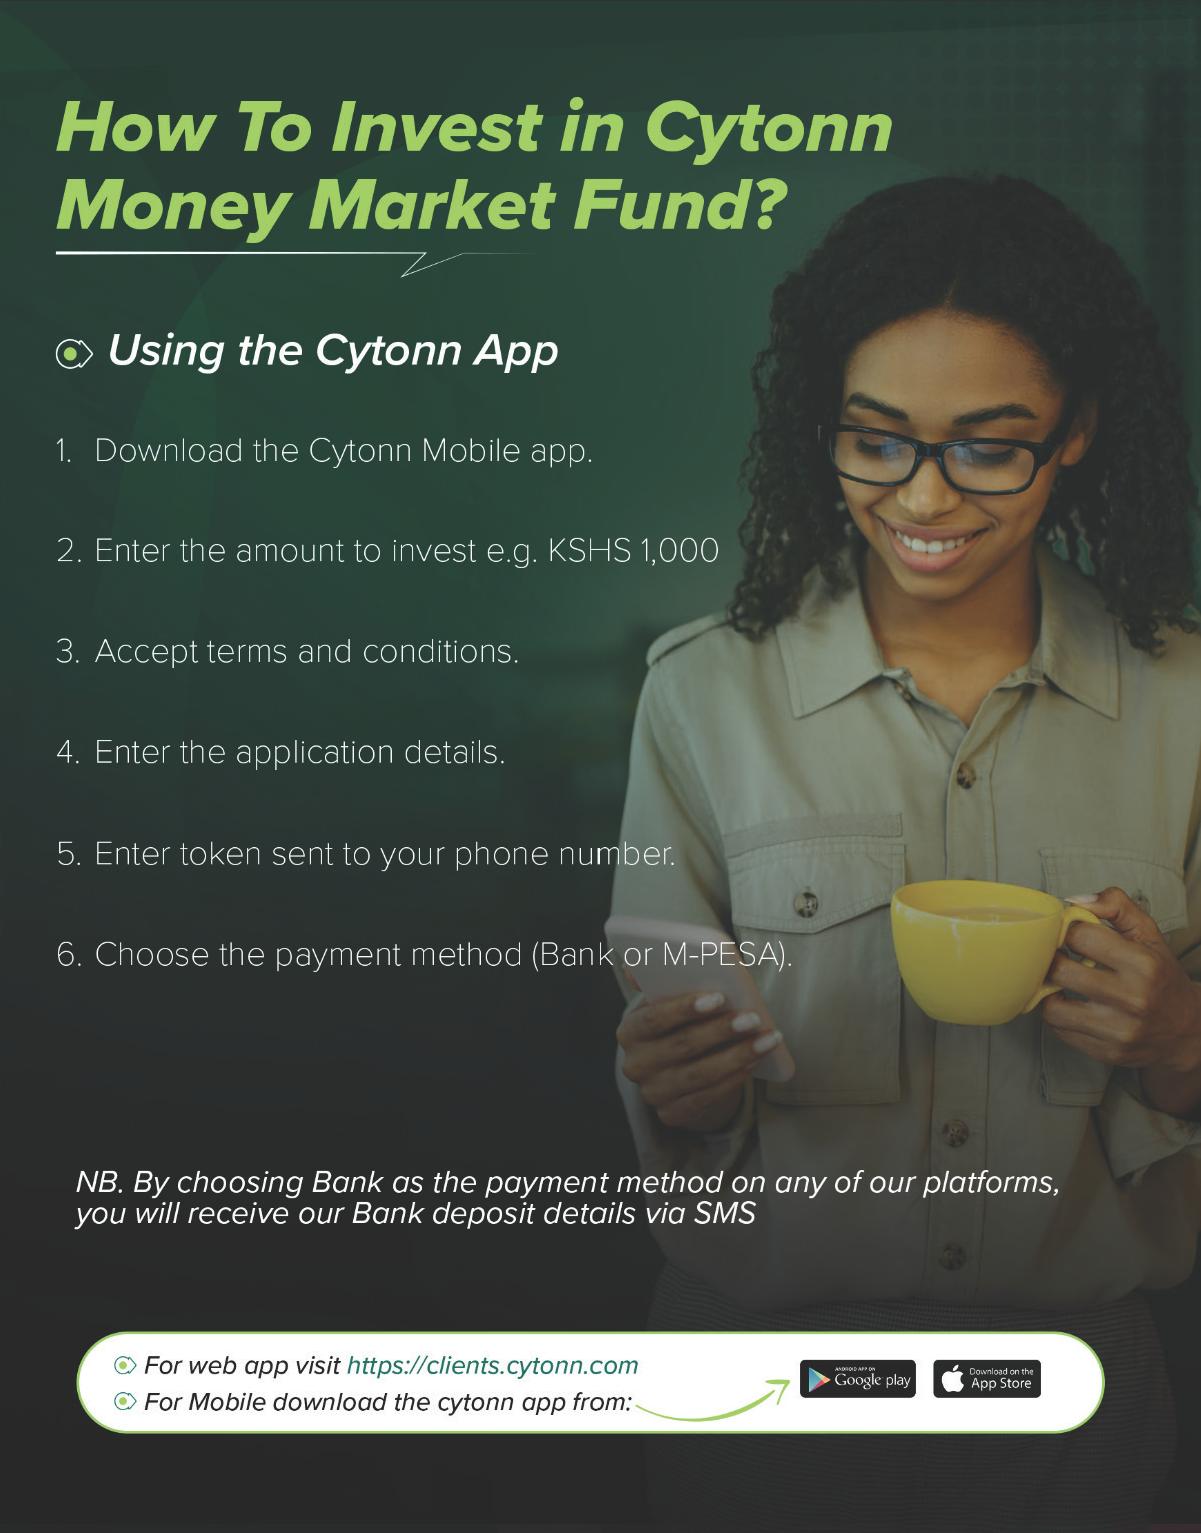 Cytonn Money Market Fund app